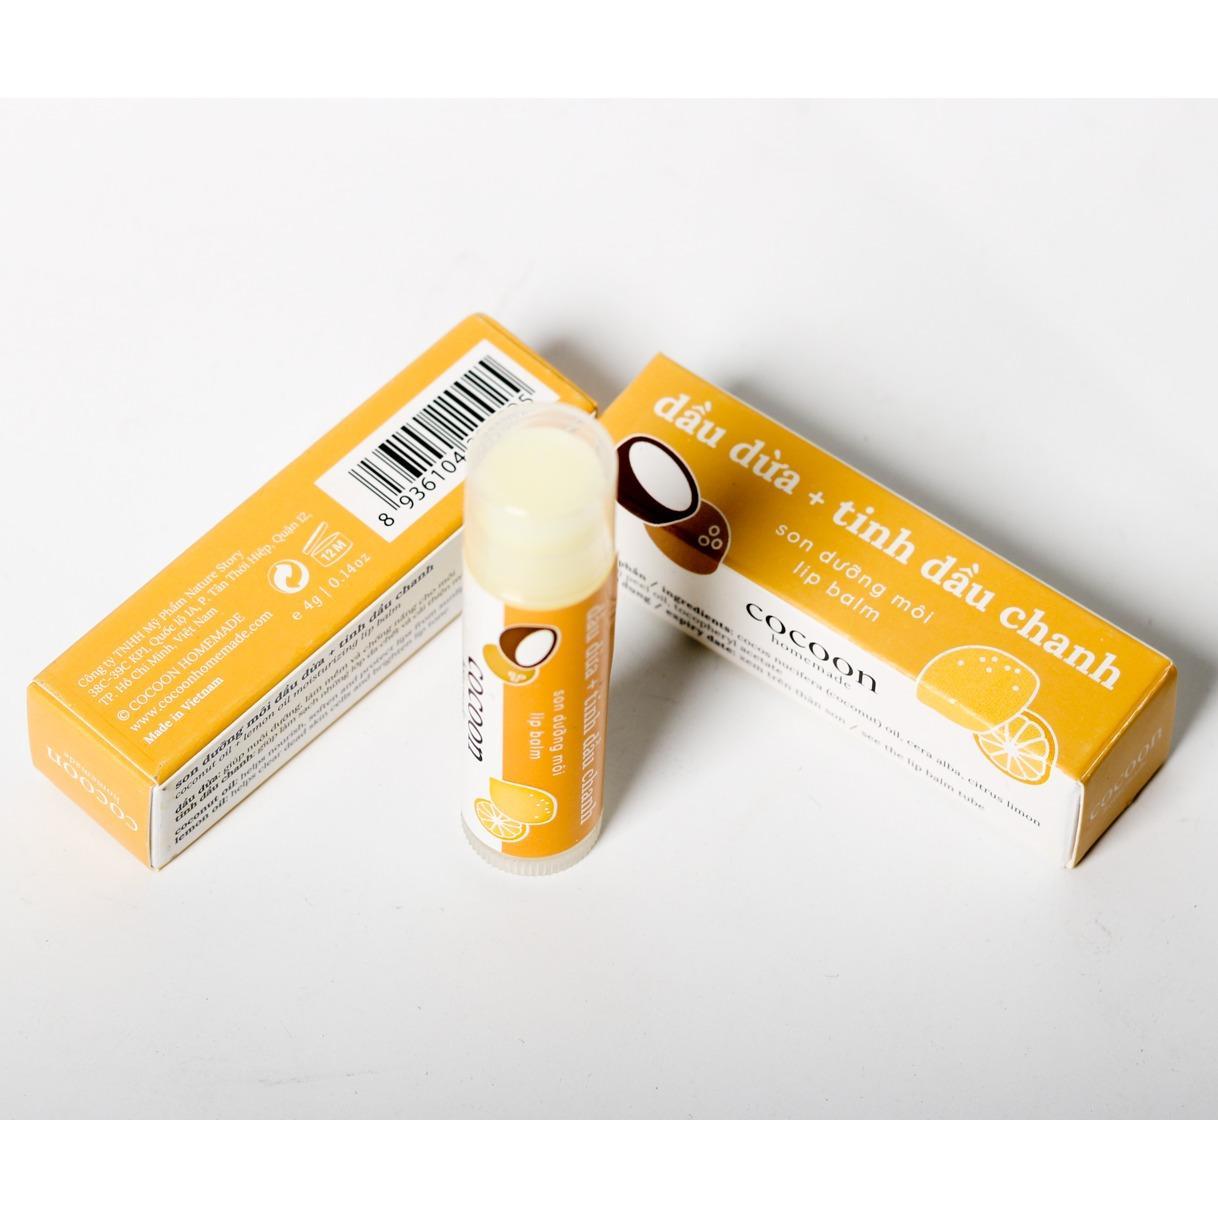 Son dưỡng môi Cocoon - Lip care 5g